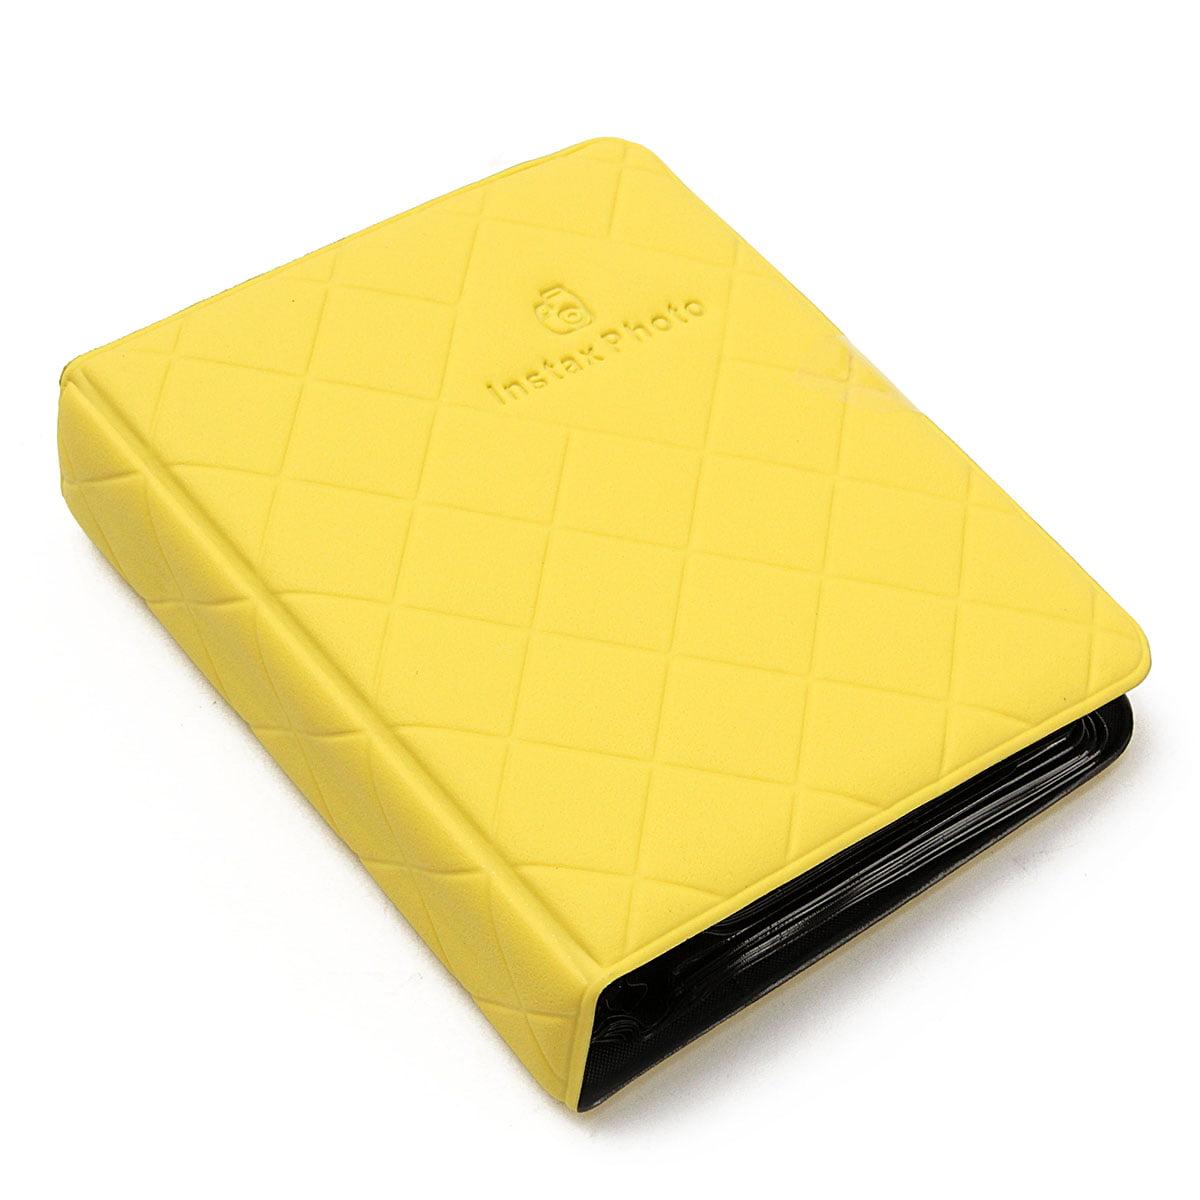 Wedlies 36 Pockets Mini Photo Album Case Storage Personalized Photo